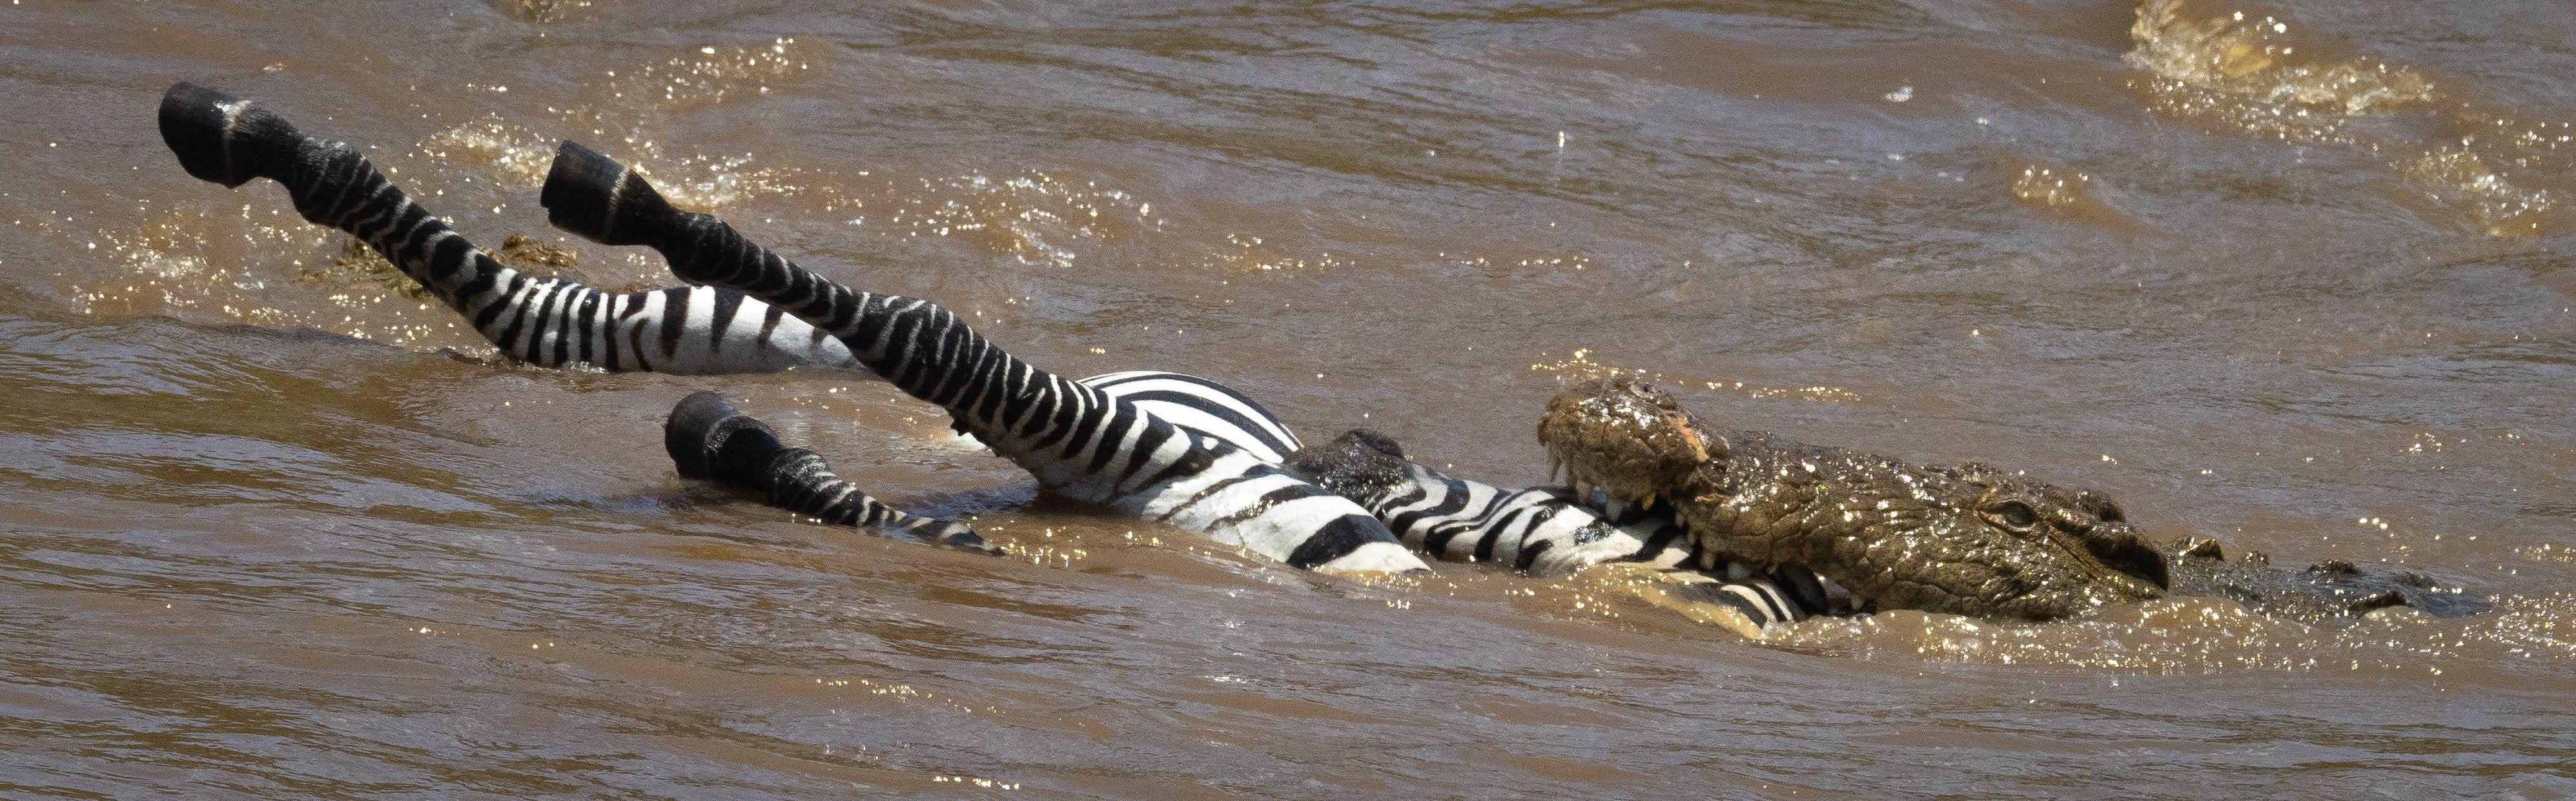 Crocodile pushing zebra upstream